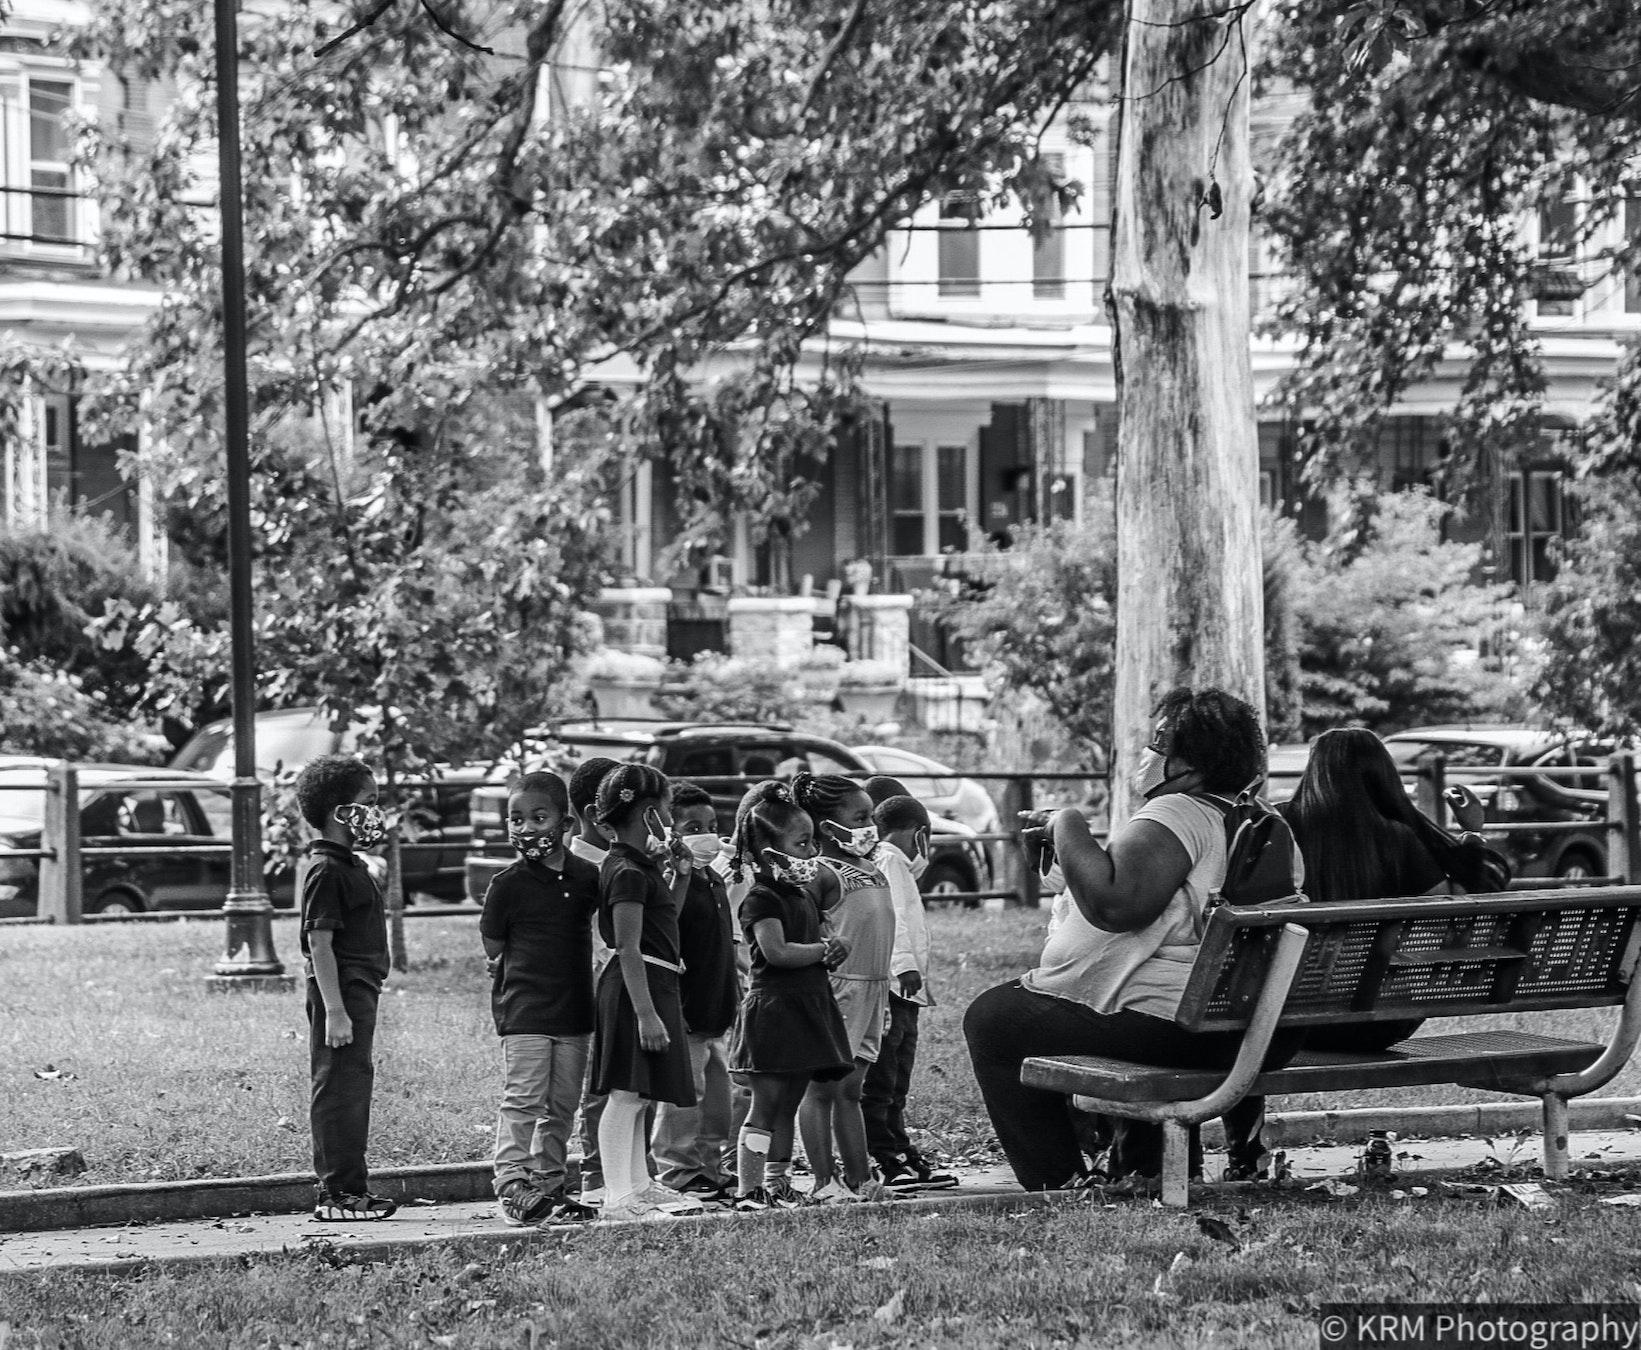 Children in Malcolm X Park  (West Philadelphia, 2020)